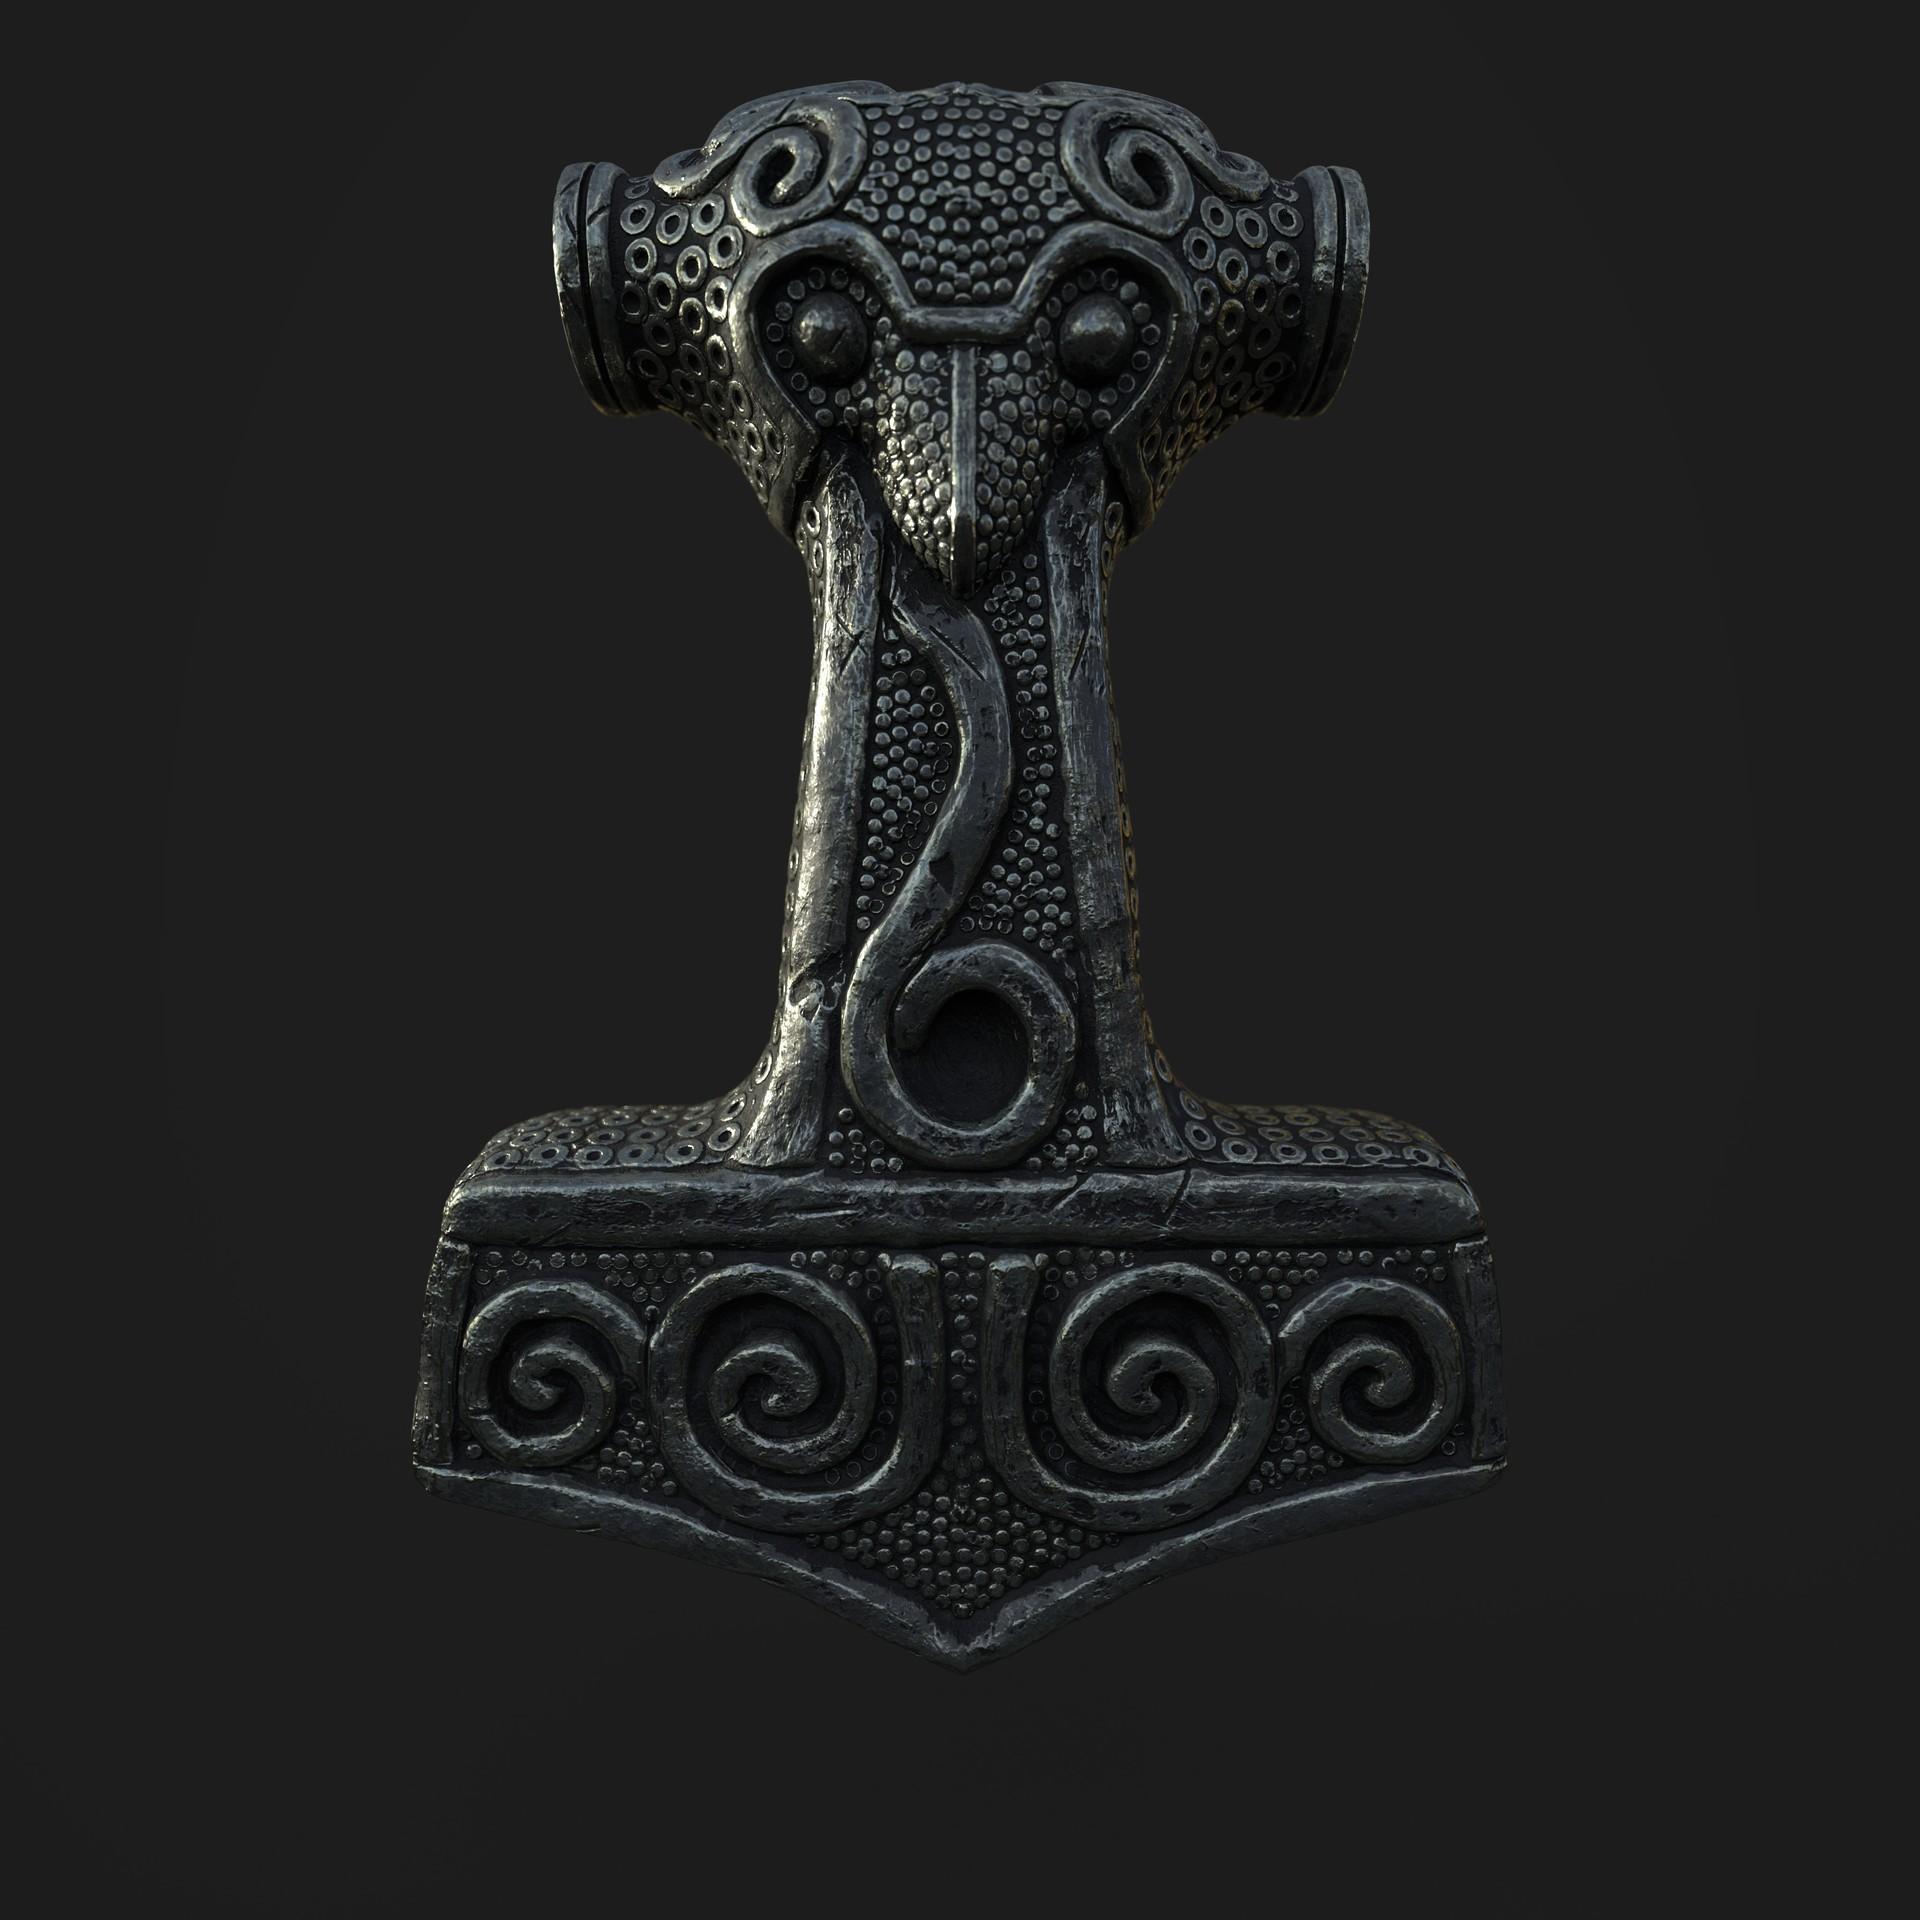 Darko mitev hammerv1 003